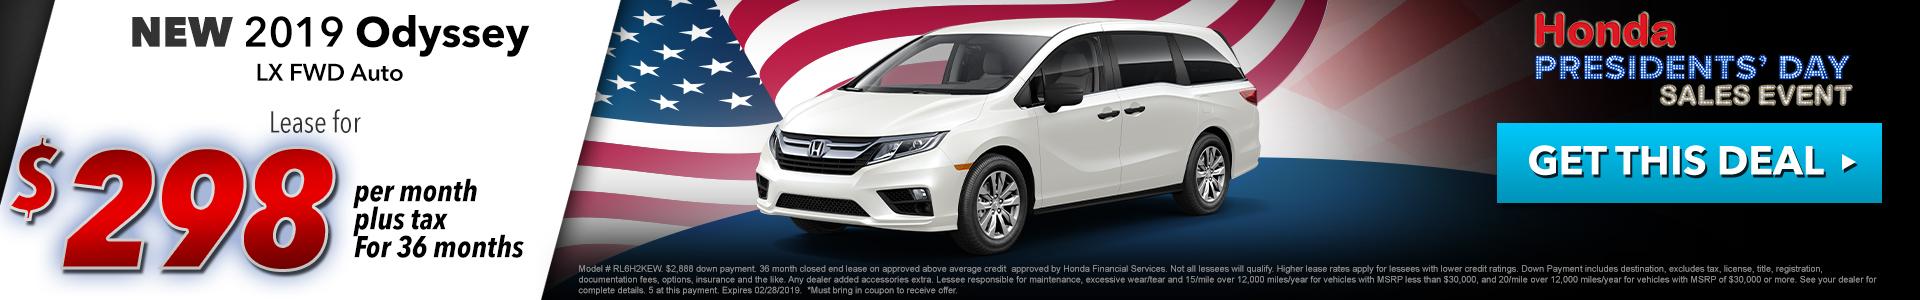 Honda Odyssey $298 Lease